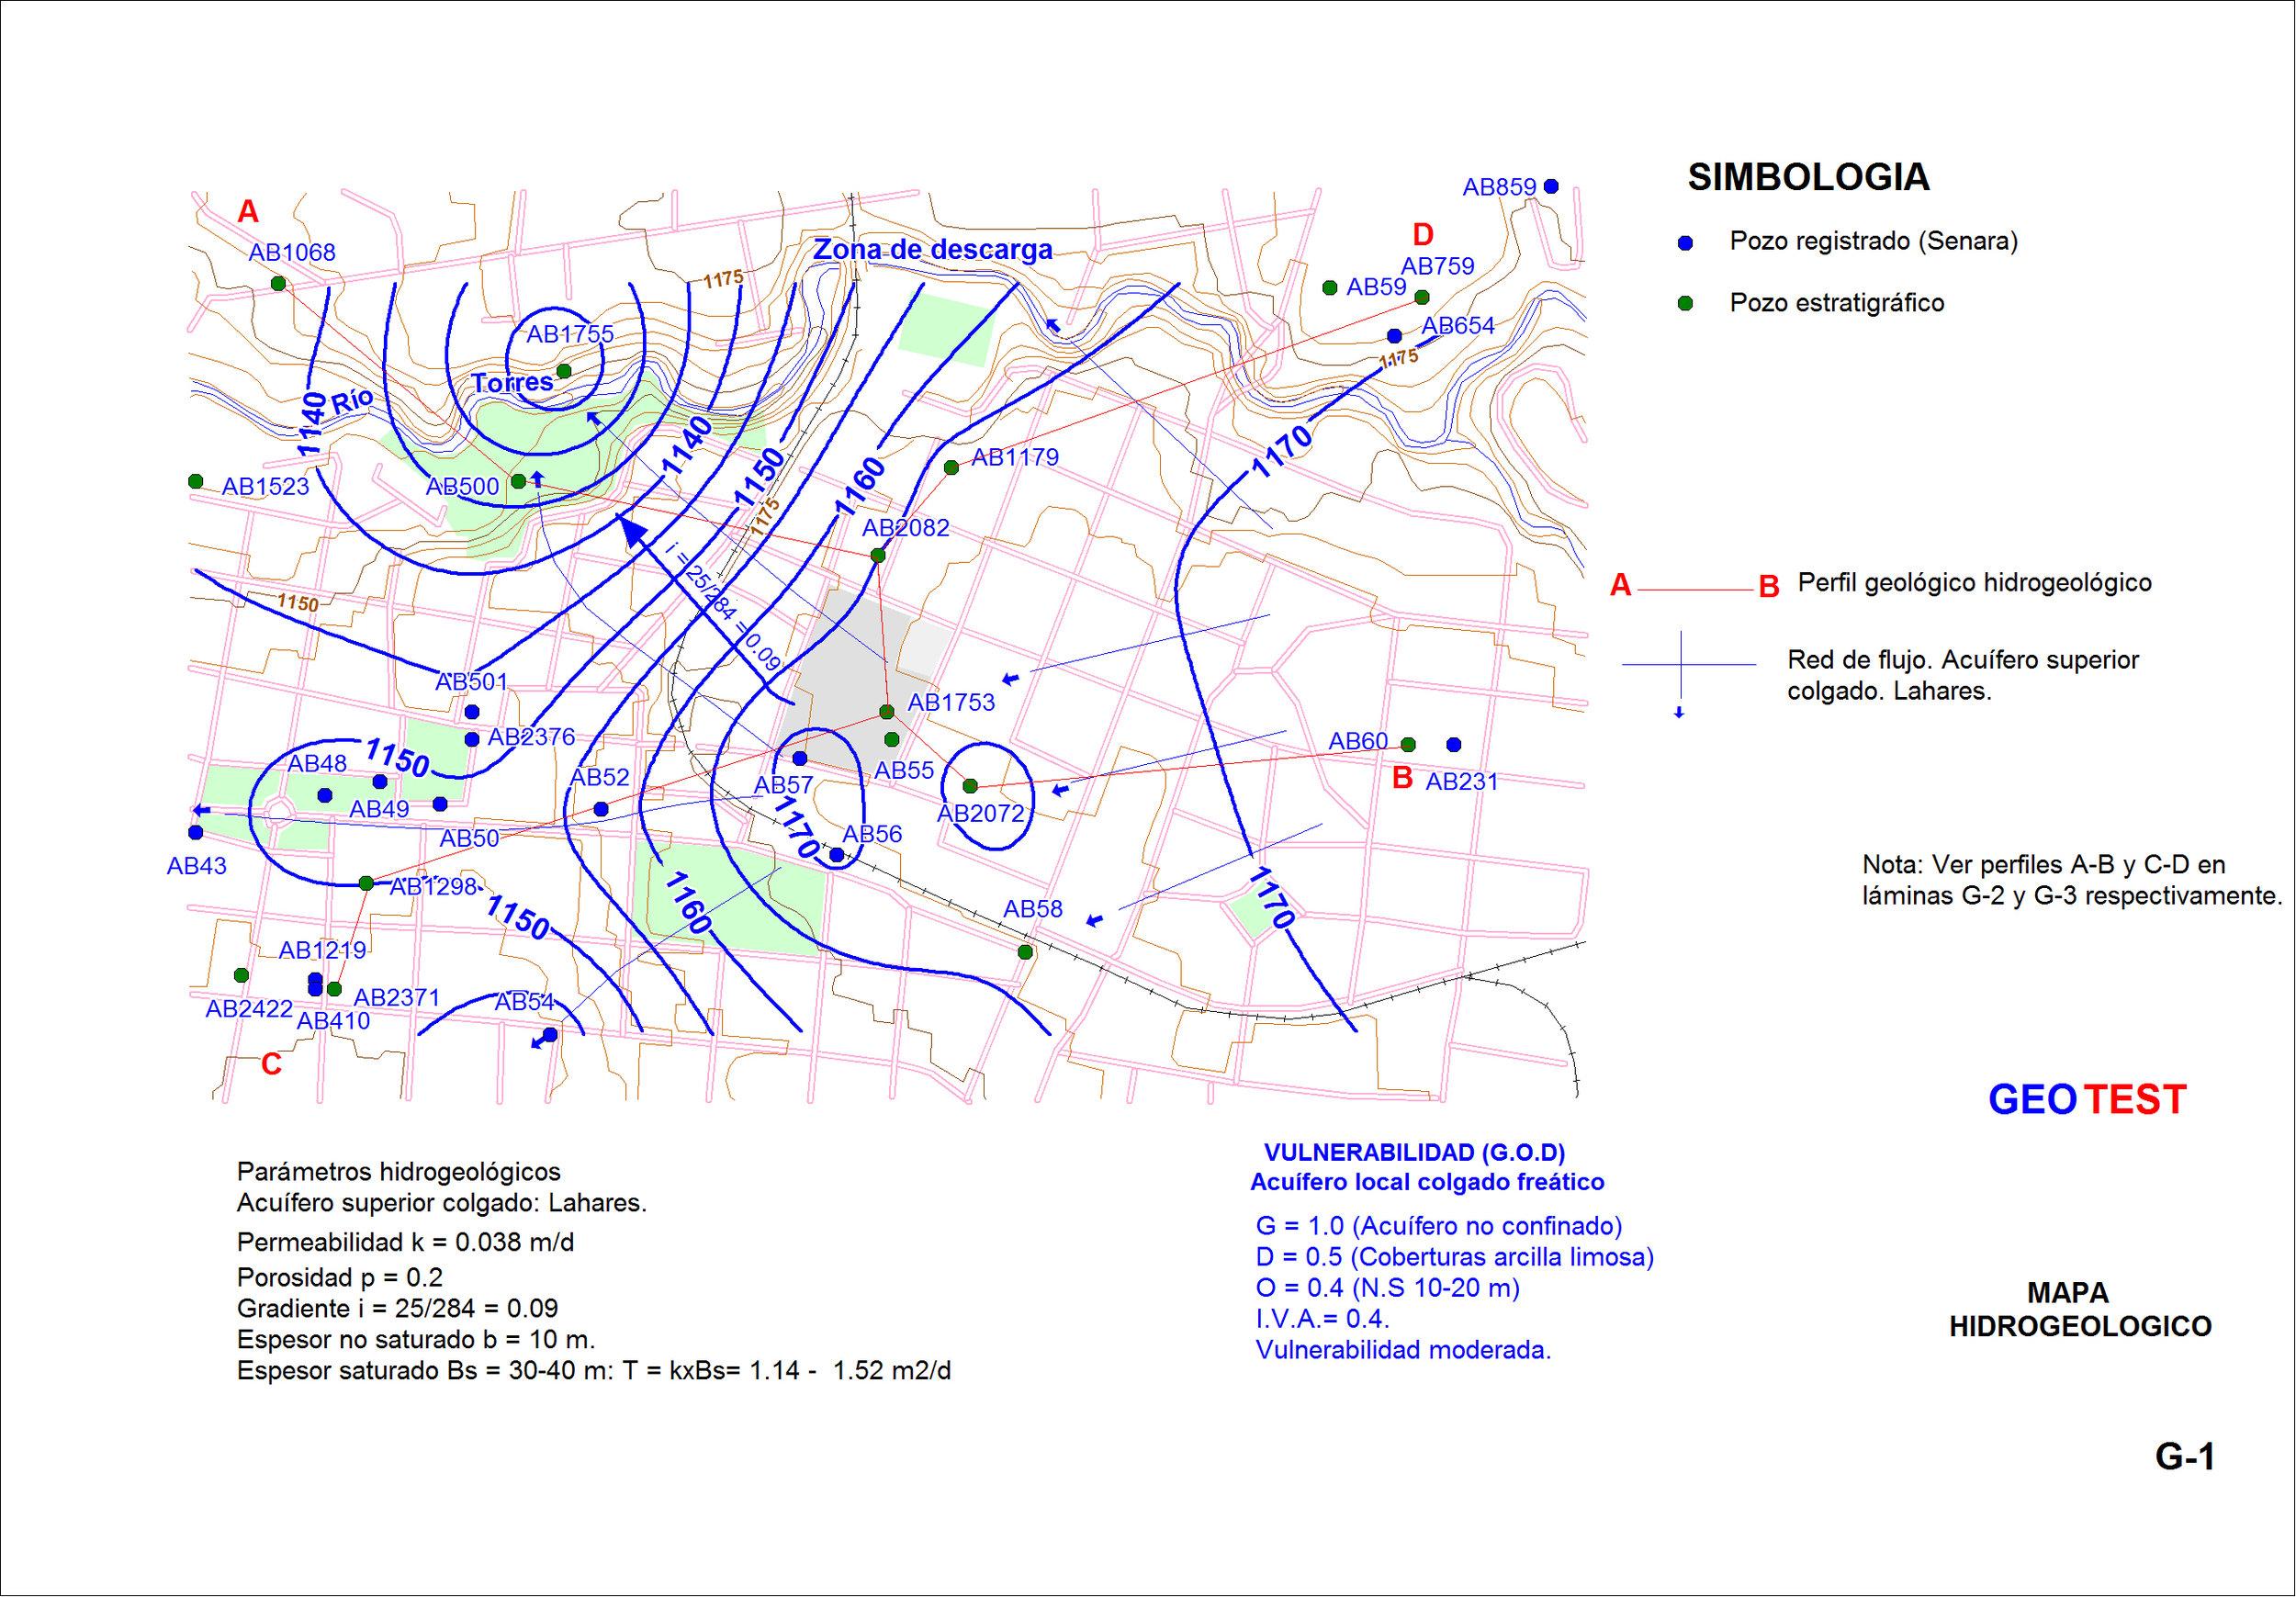 Mapa hidrogeológico - Hydrogeologic map